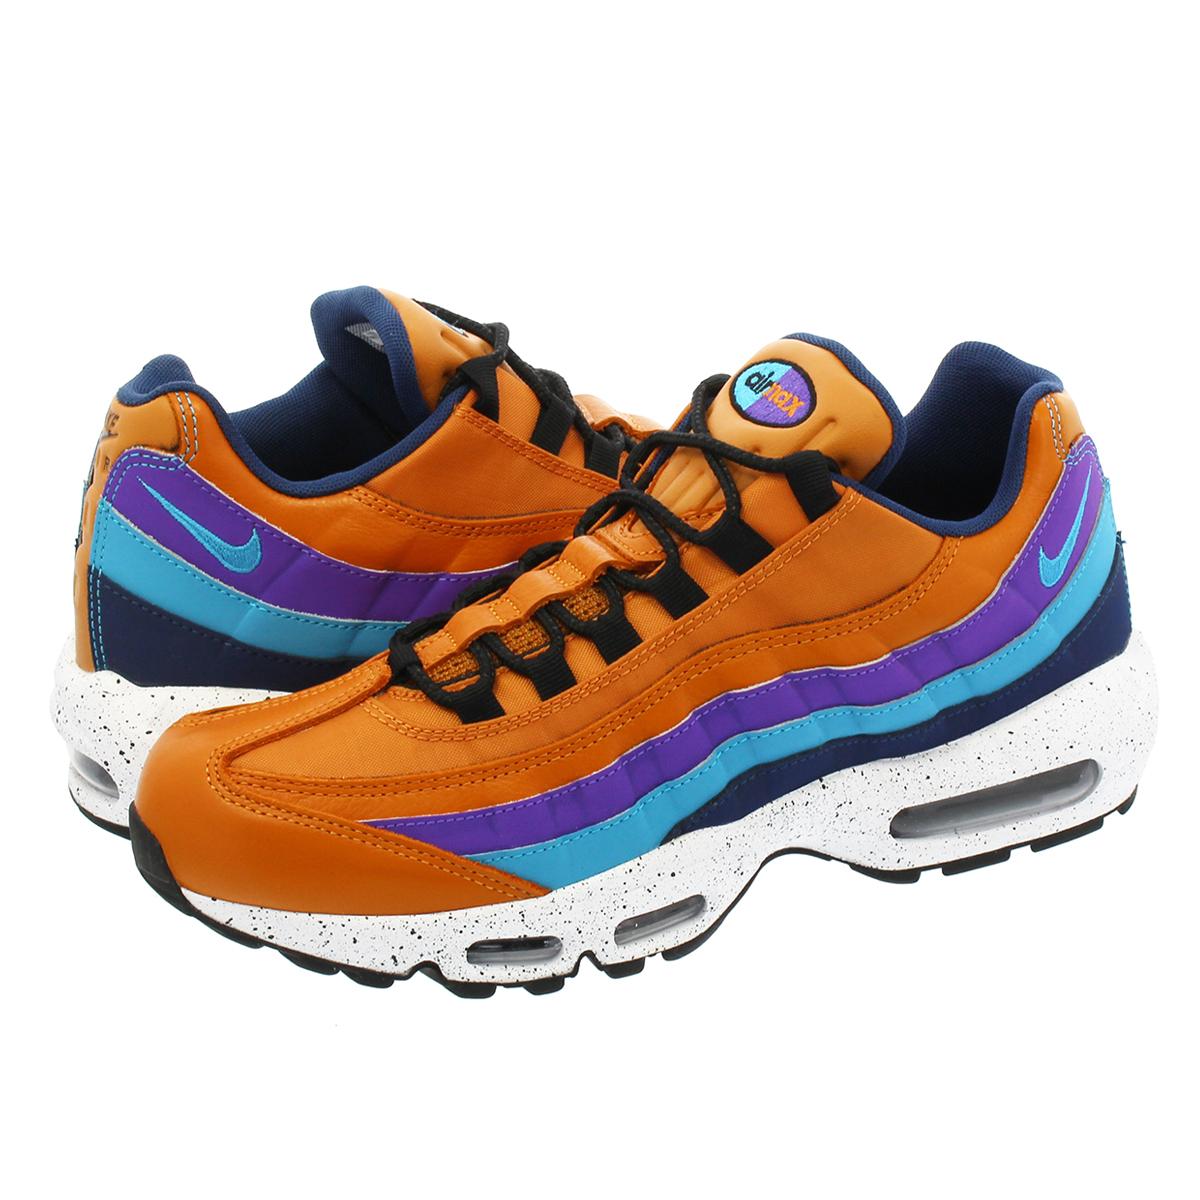 Rakuten Global Market: Nike Air Max 1 Premium Men's Shoes Shoes